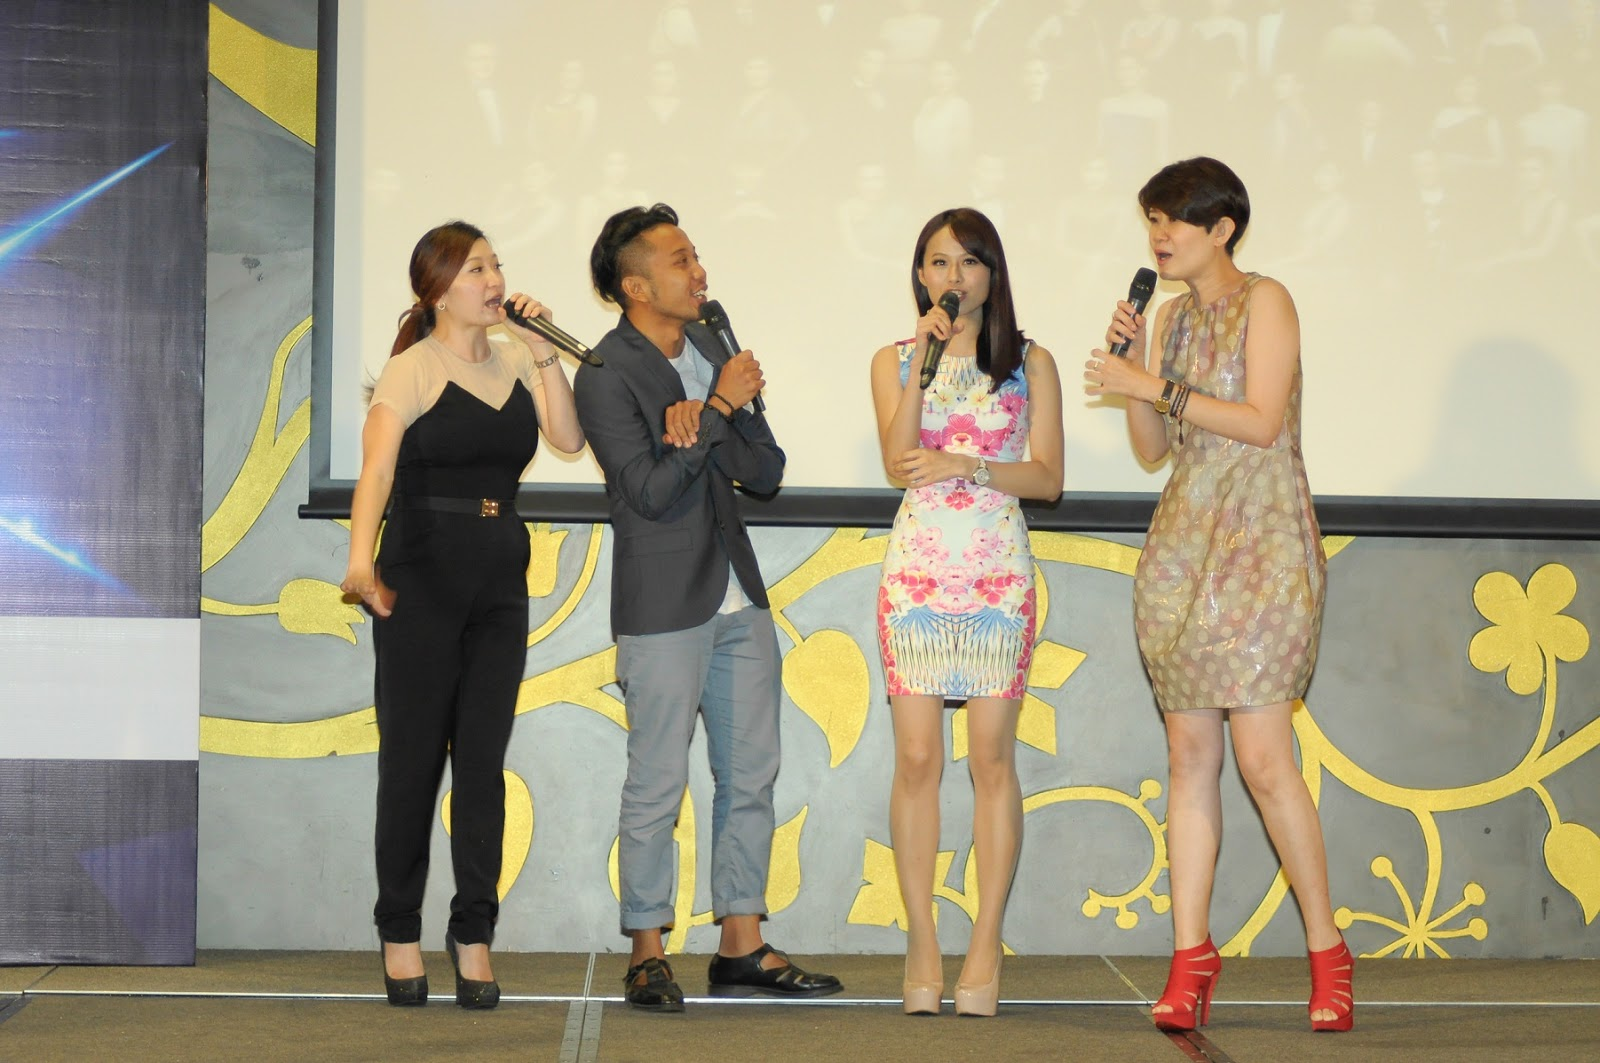 2014《金视奖》5强入围名单揭晓 NTV7 GOLDEN AWARDS 2014 TOP 5 NOMINEES UNVEILED